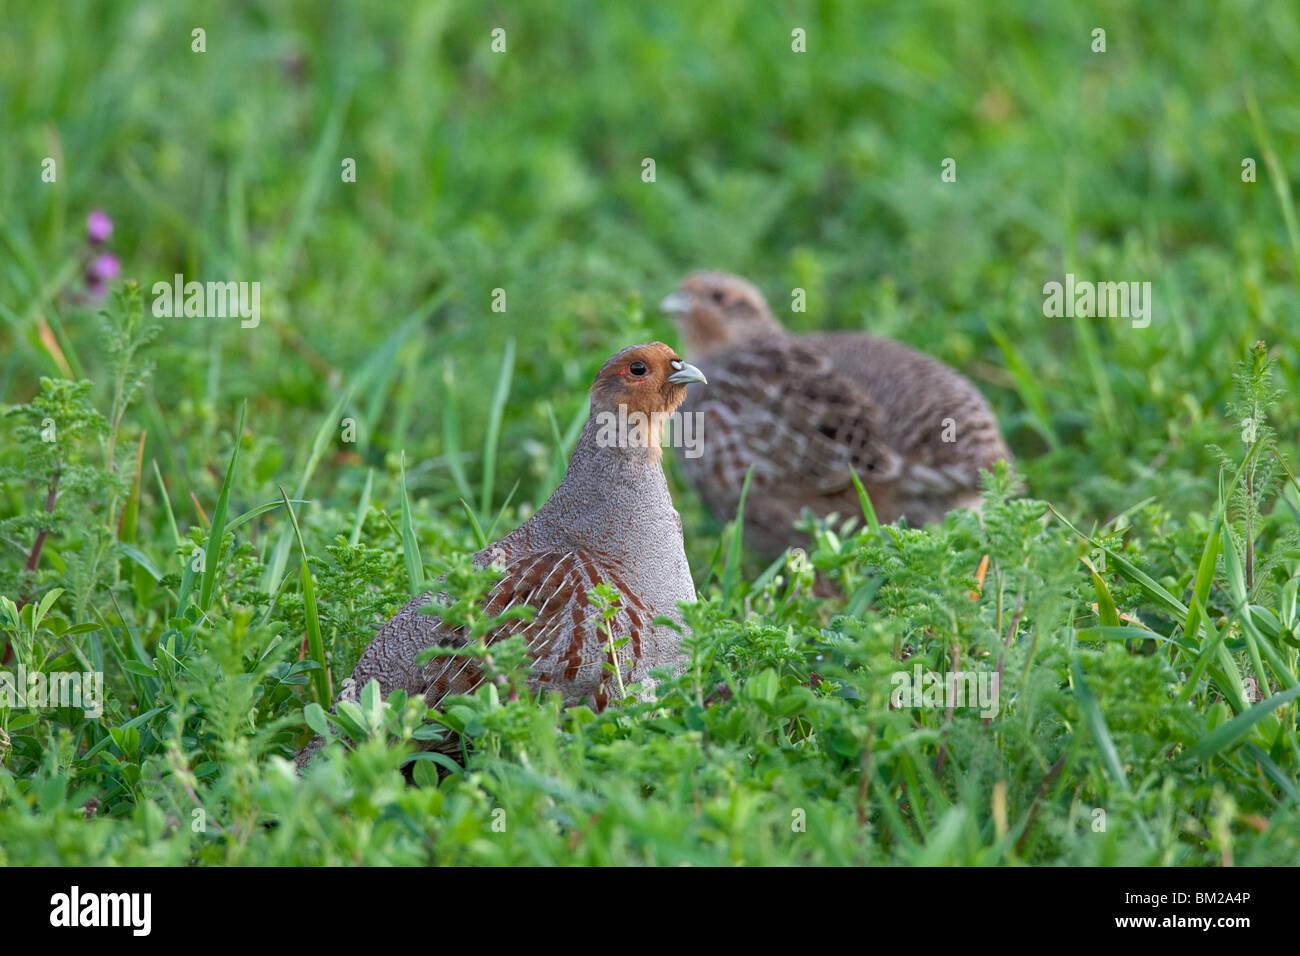 Grey Partridge (Perdix perdix) couple foraging in field, Germany - Stock Image